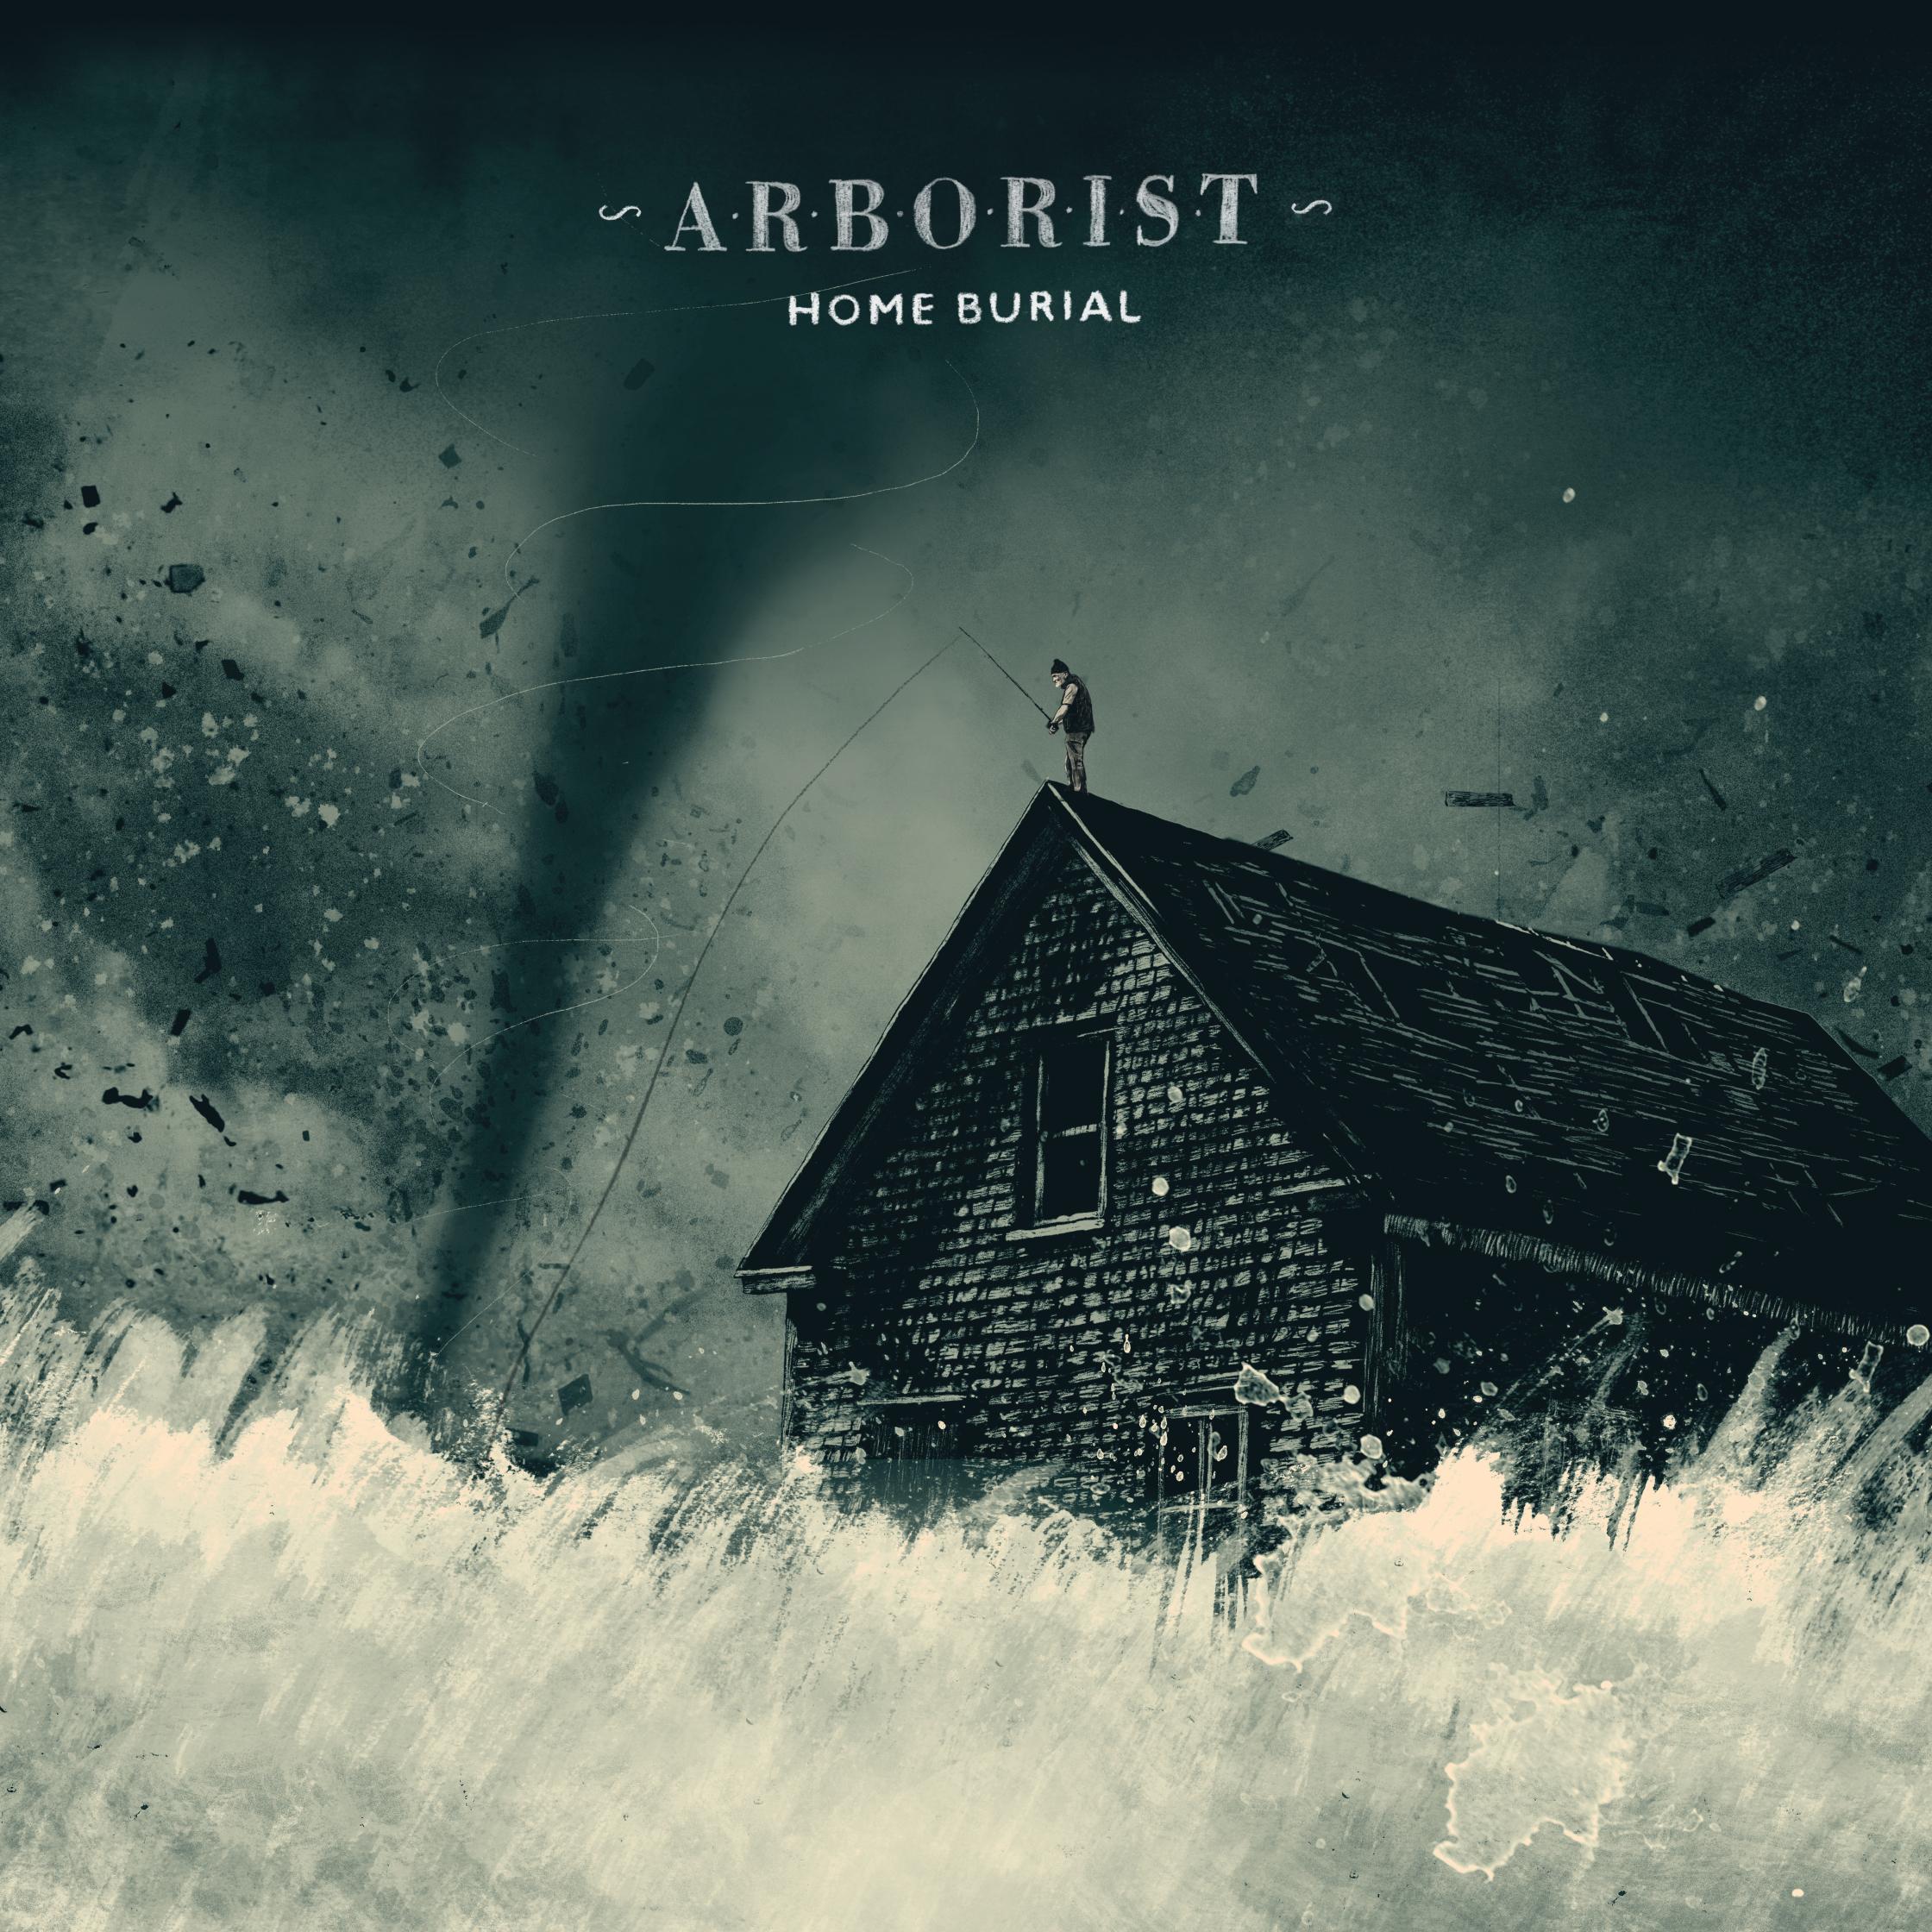 ARBORIST_FINAL_NEW.jpg